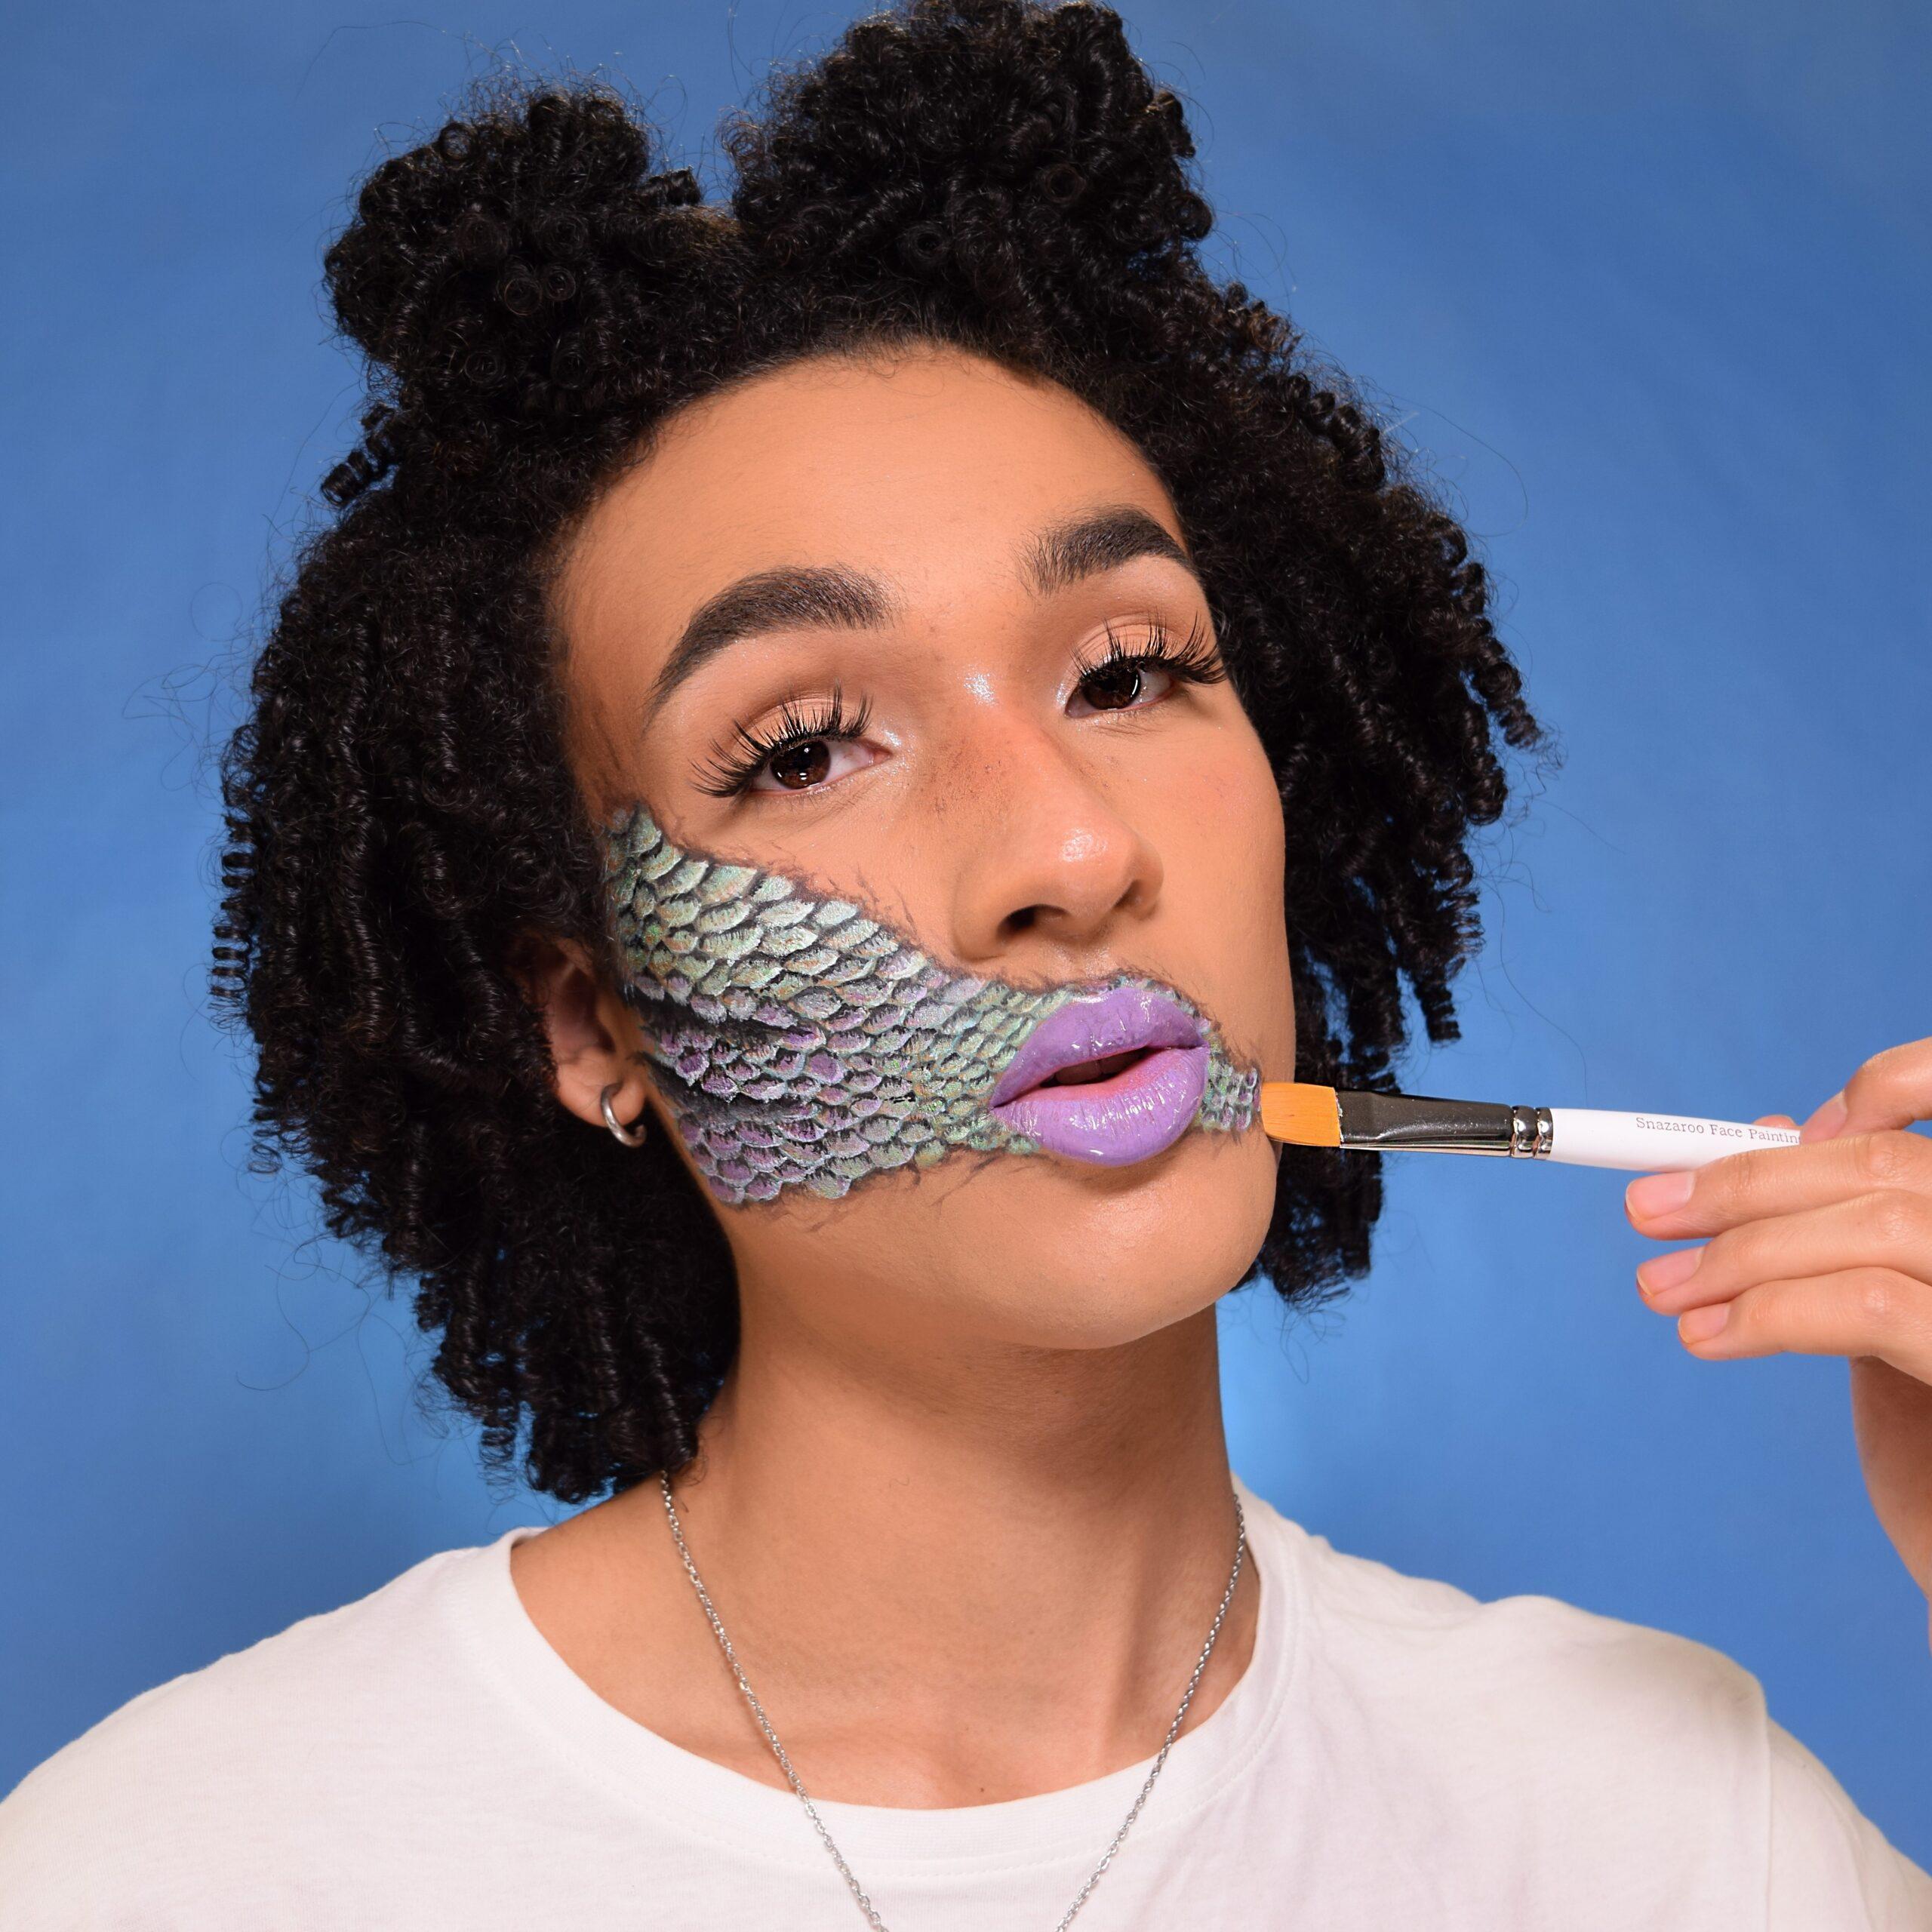 Mermaid Scales Makeup design